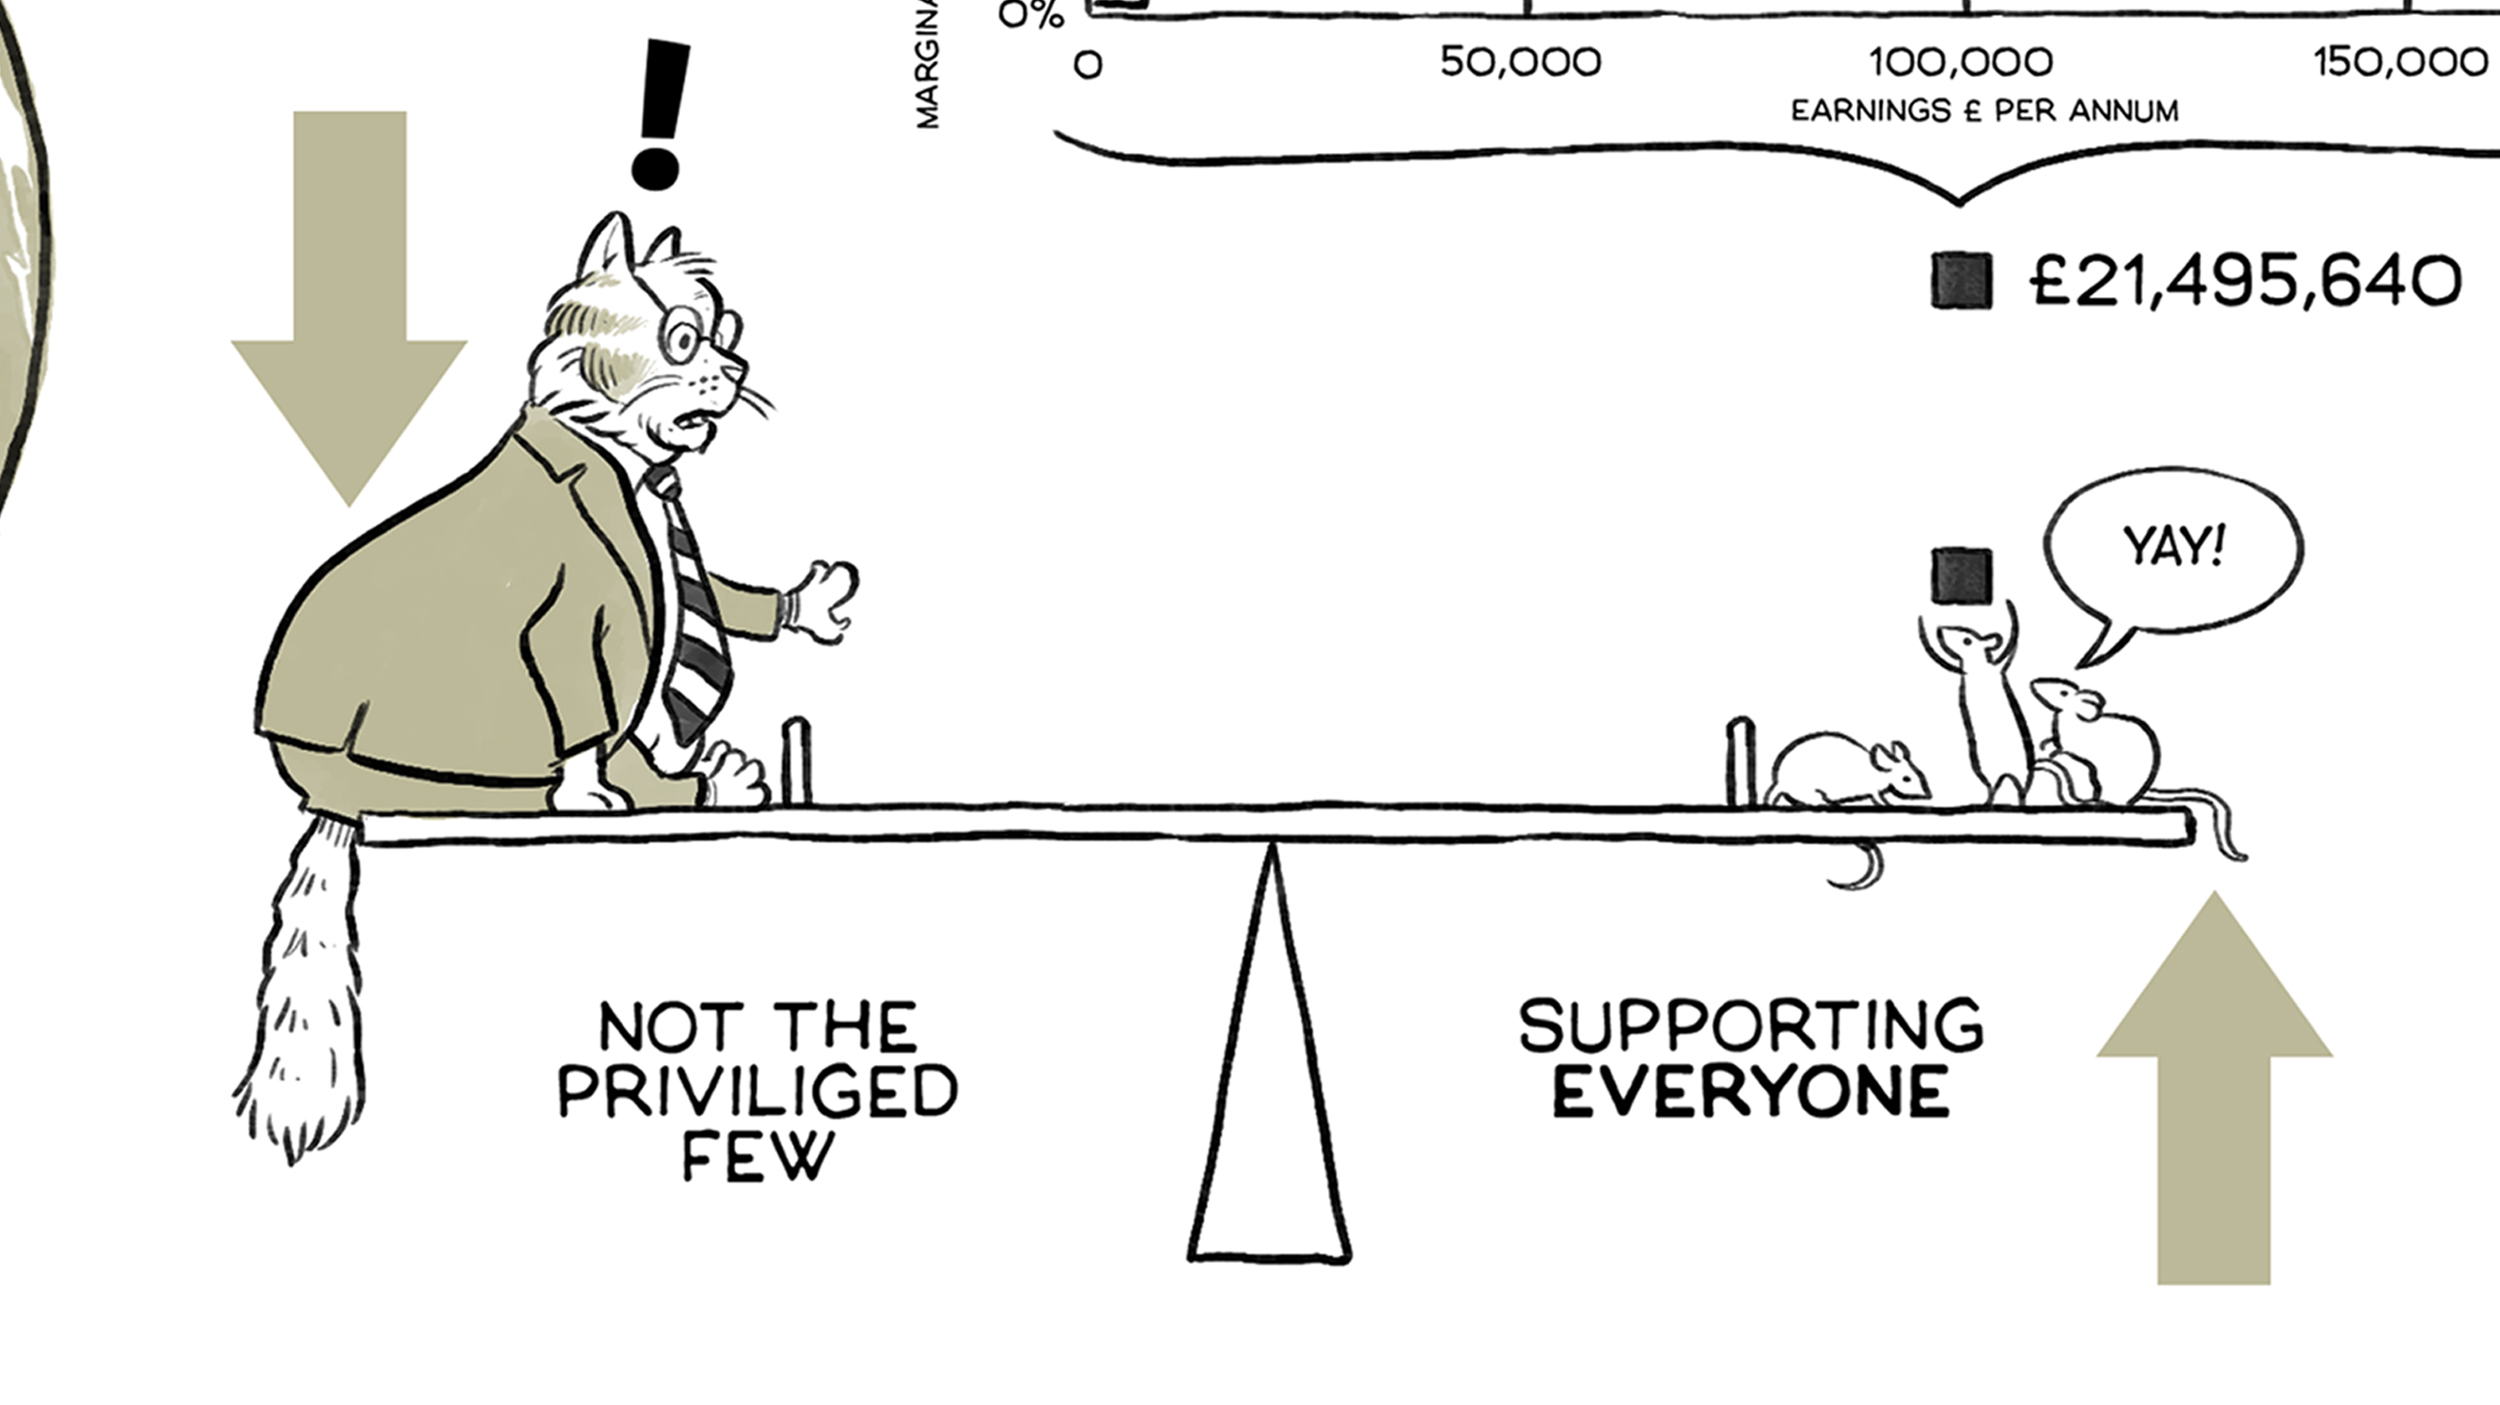 rsa-basic-income-cognitive-07.jpg